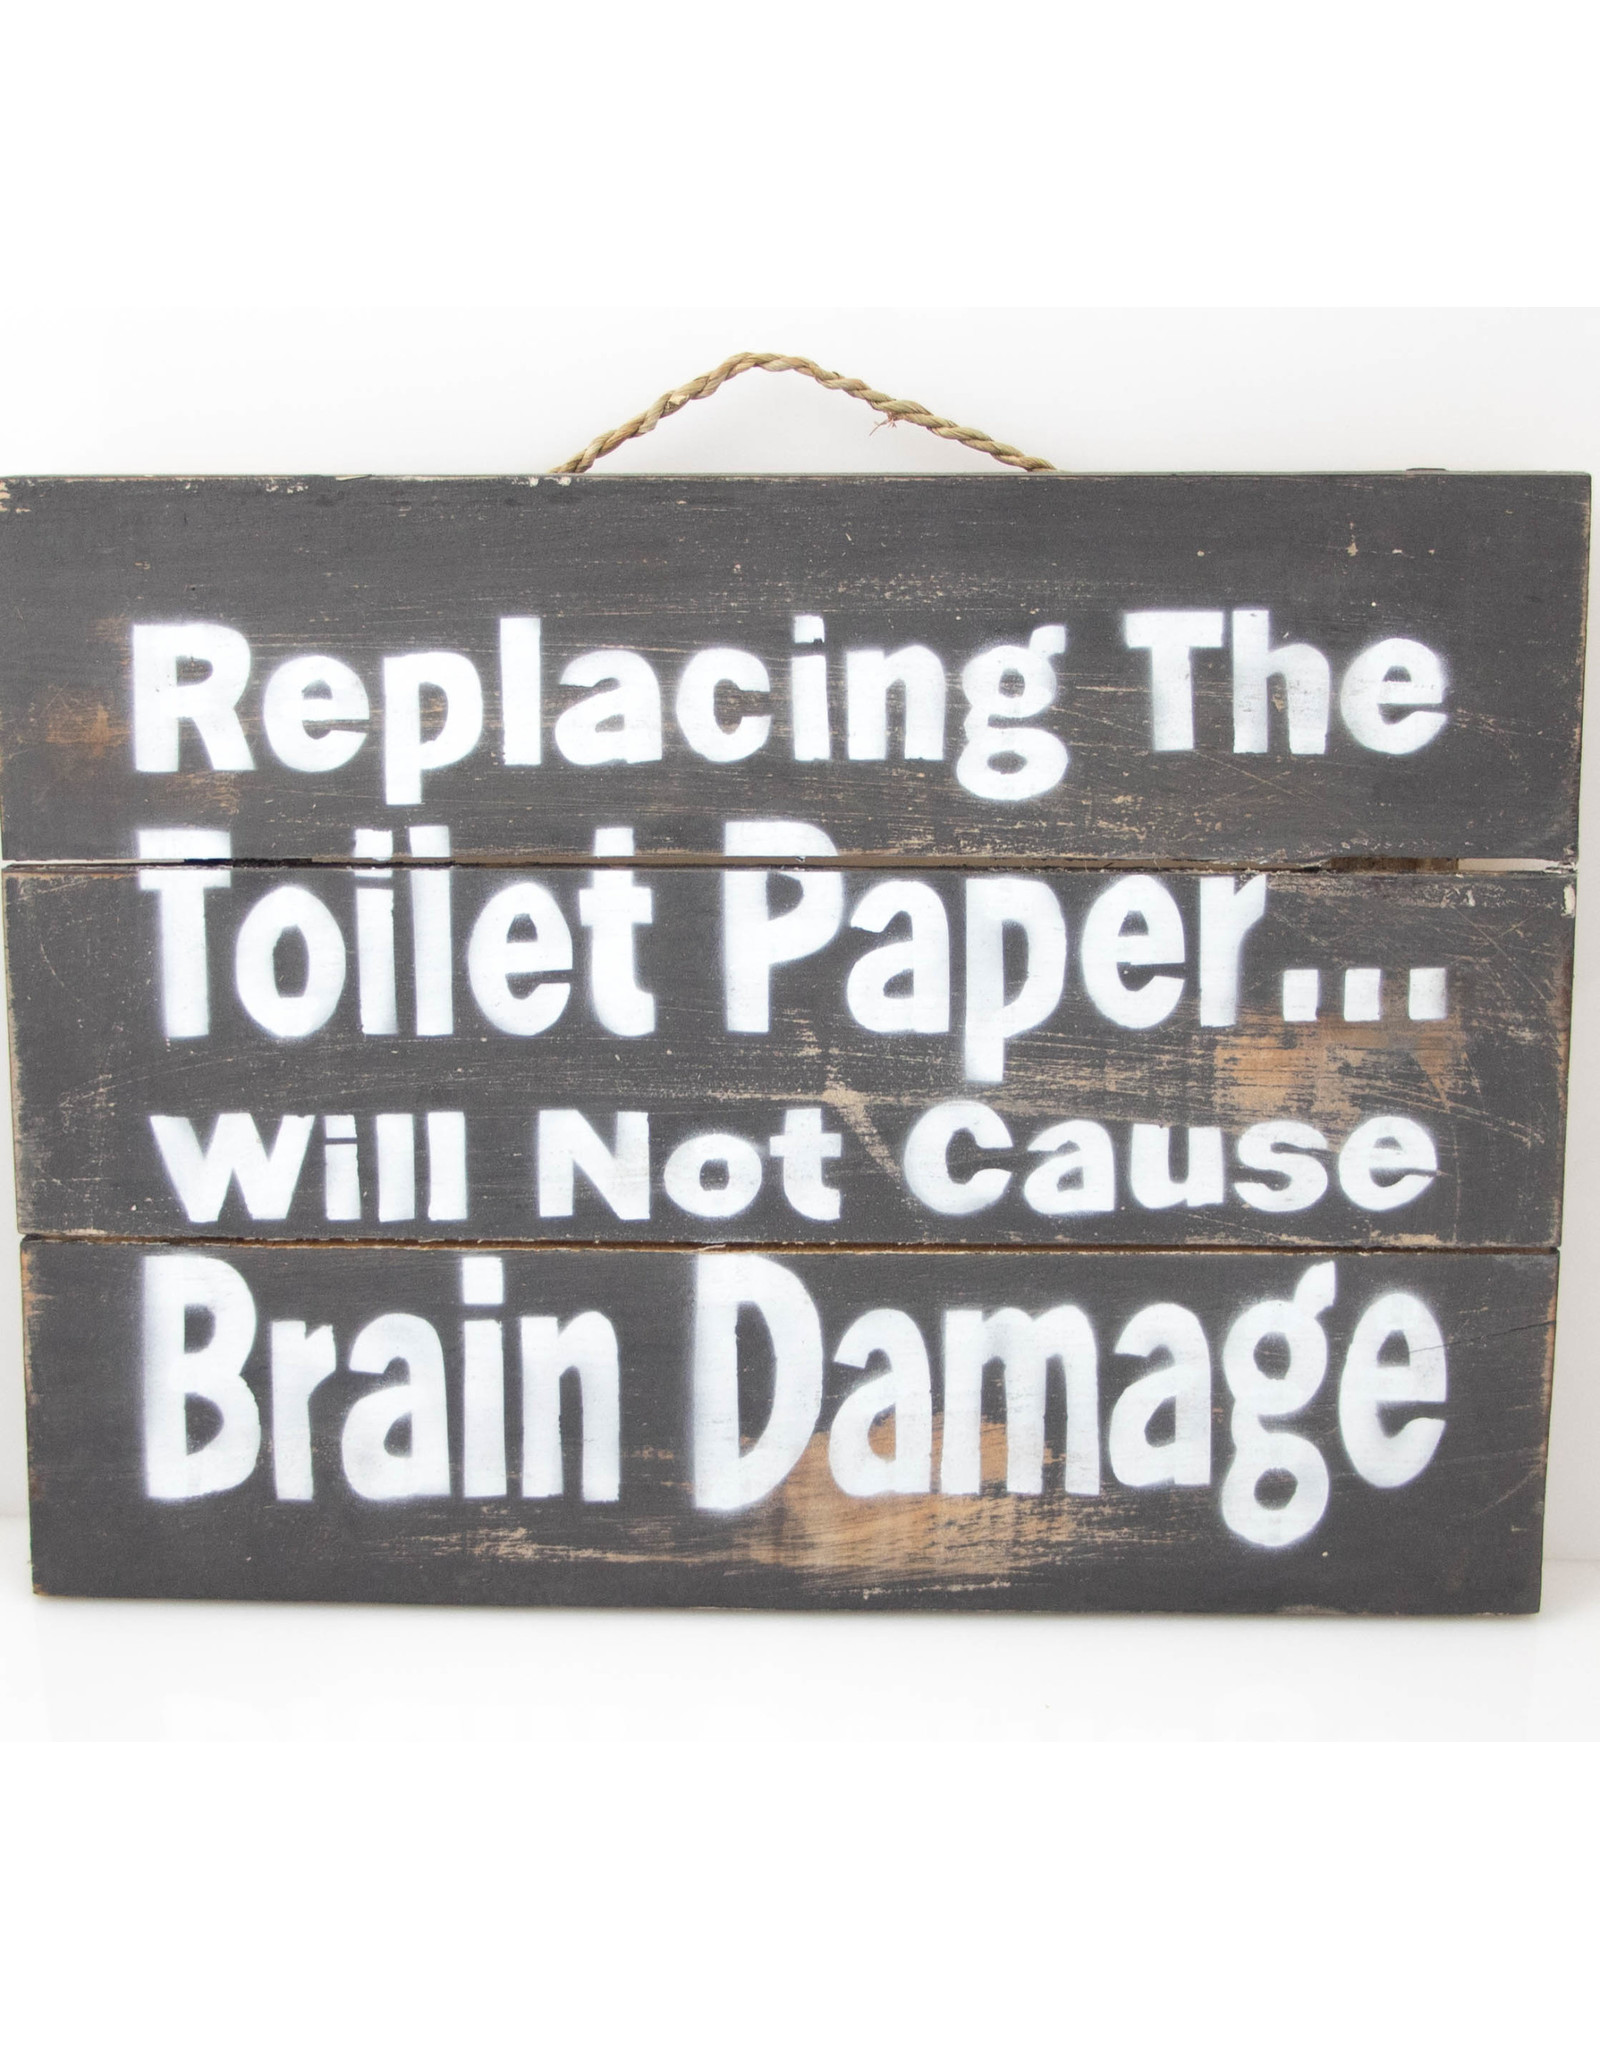 No Brain damage